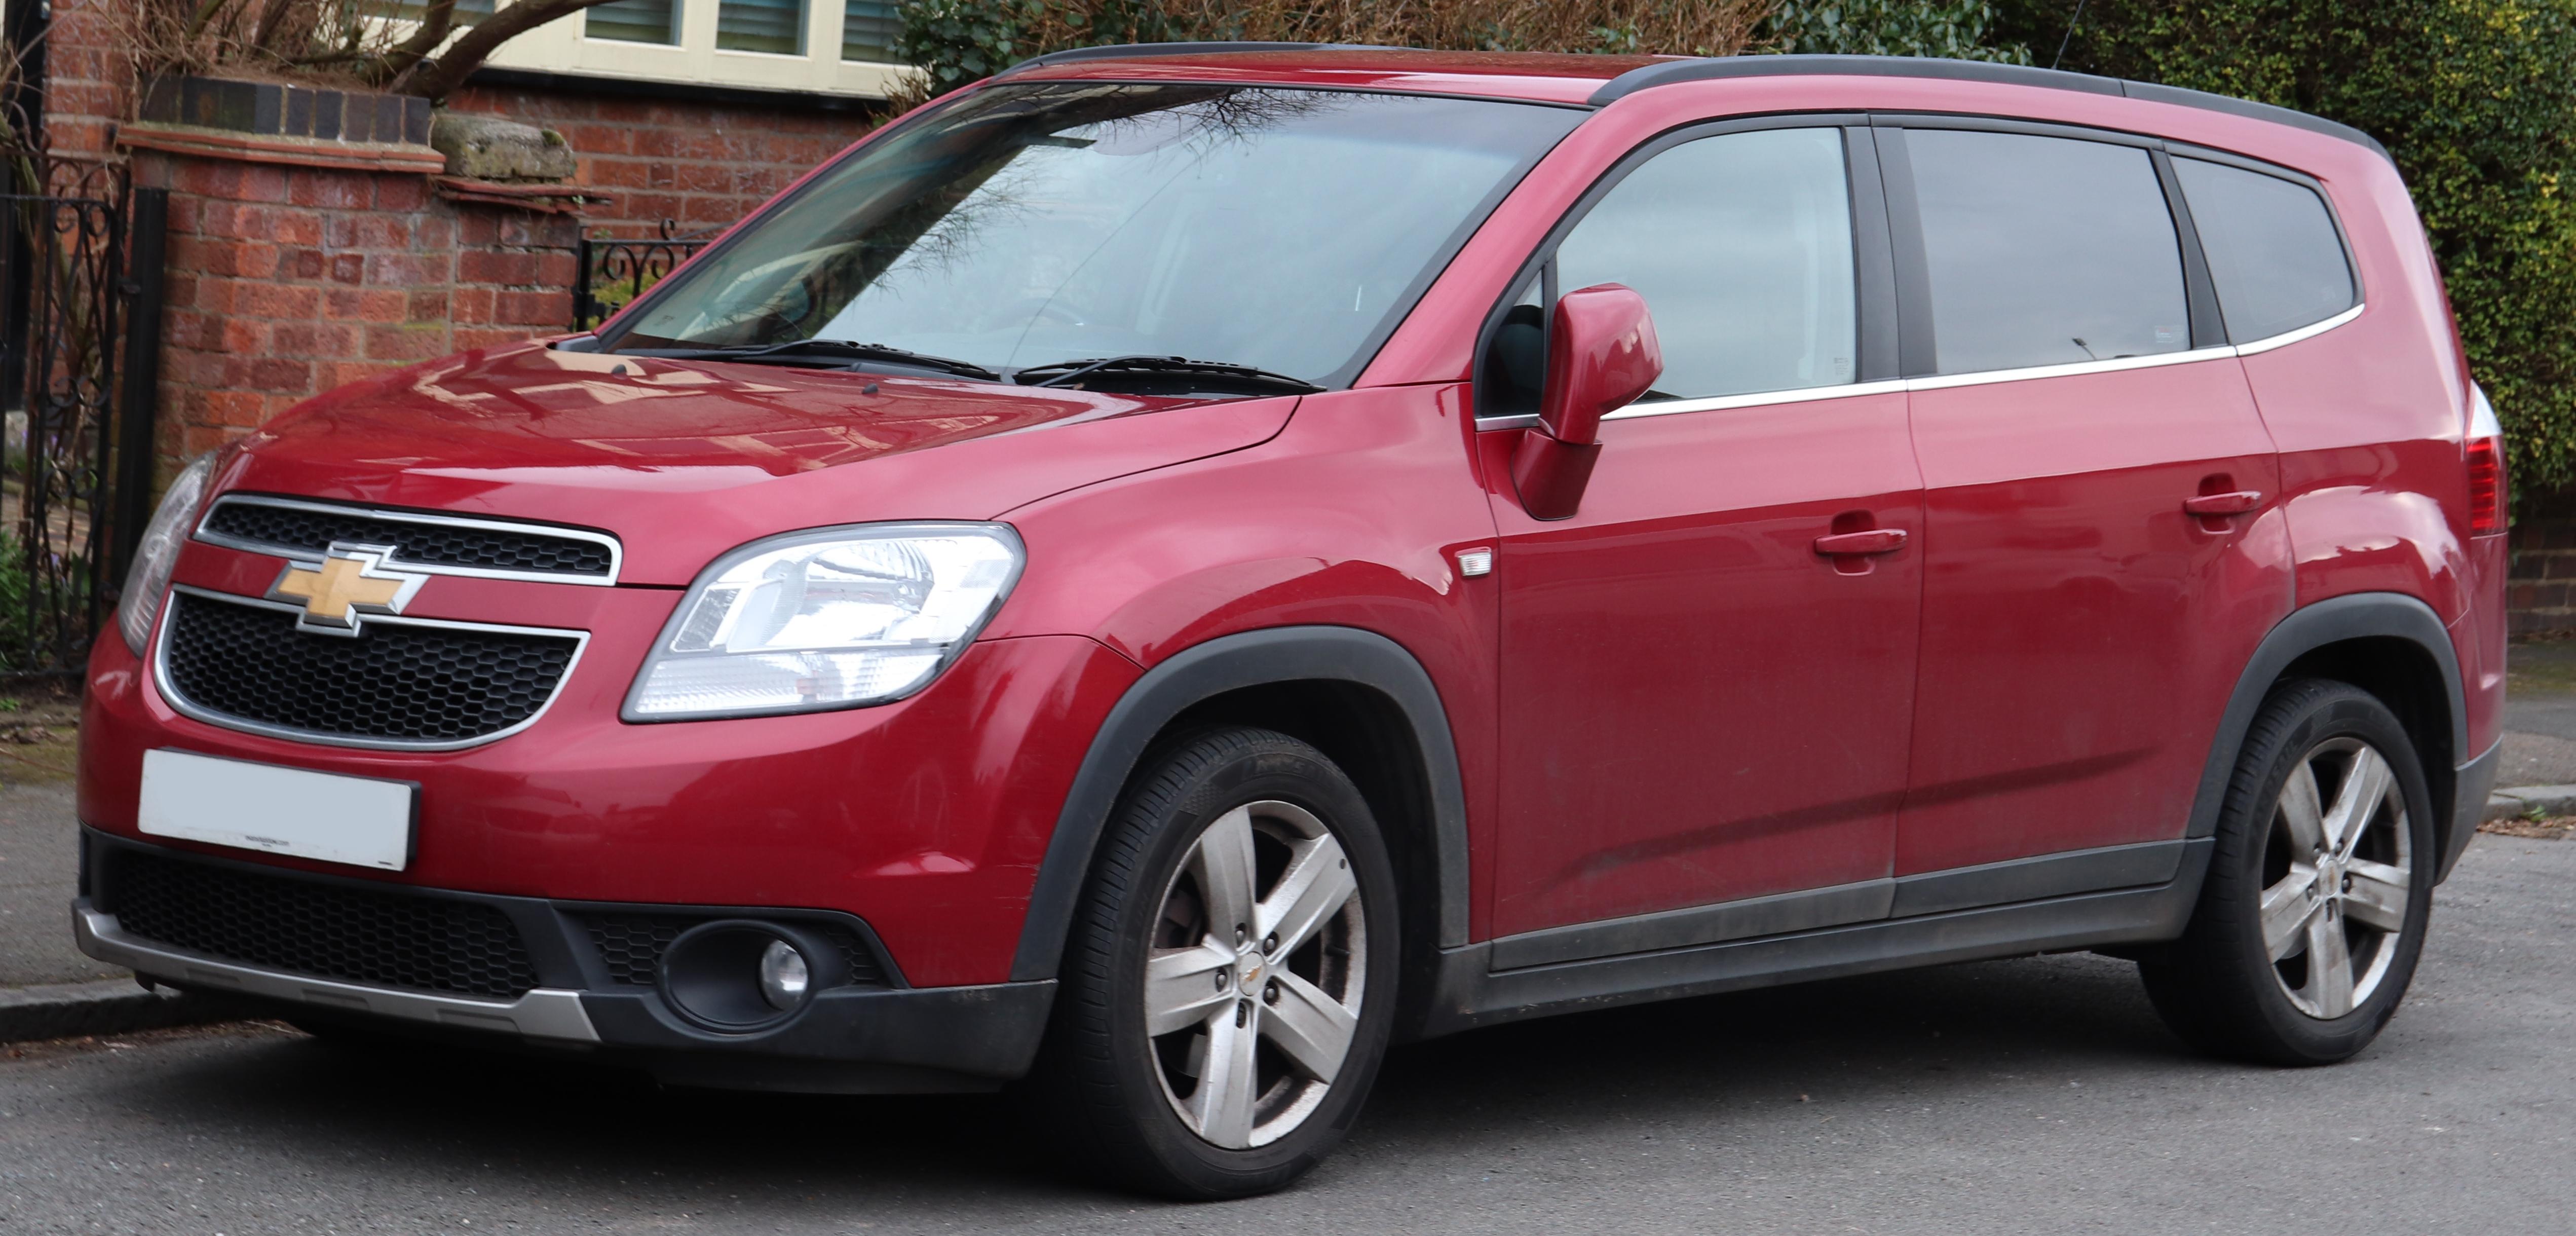 Kekurangan Chevrolet Orlando 2012 Tangguh